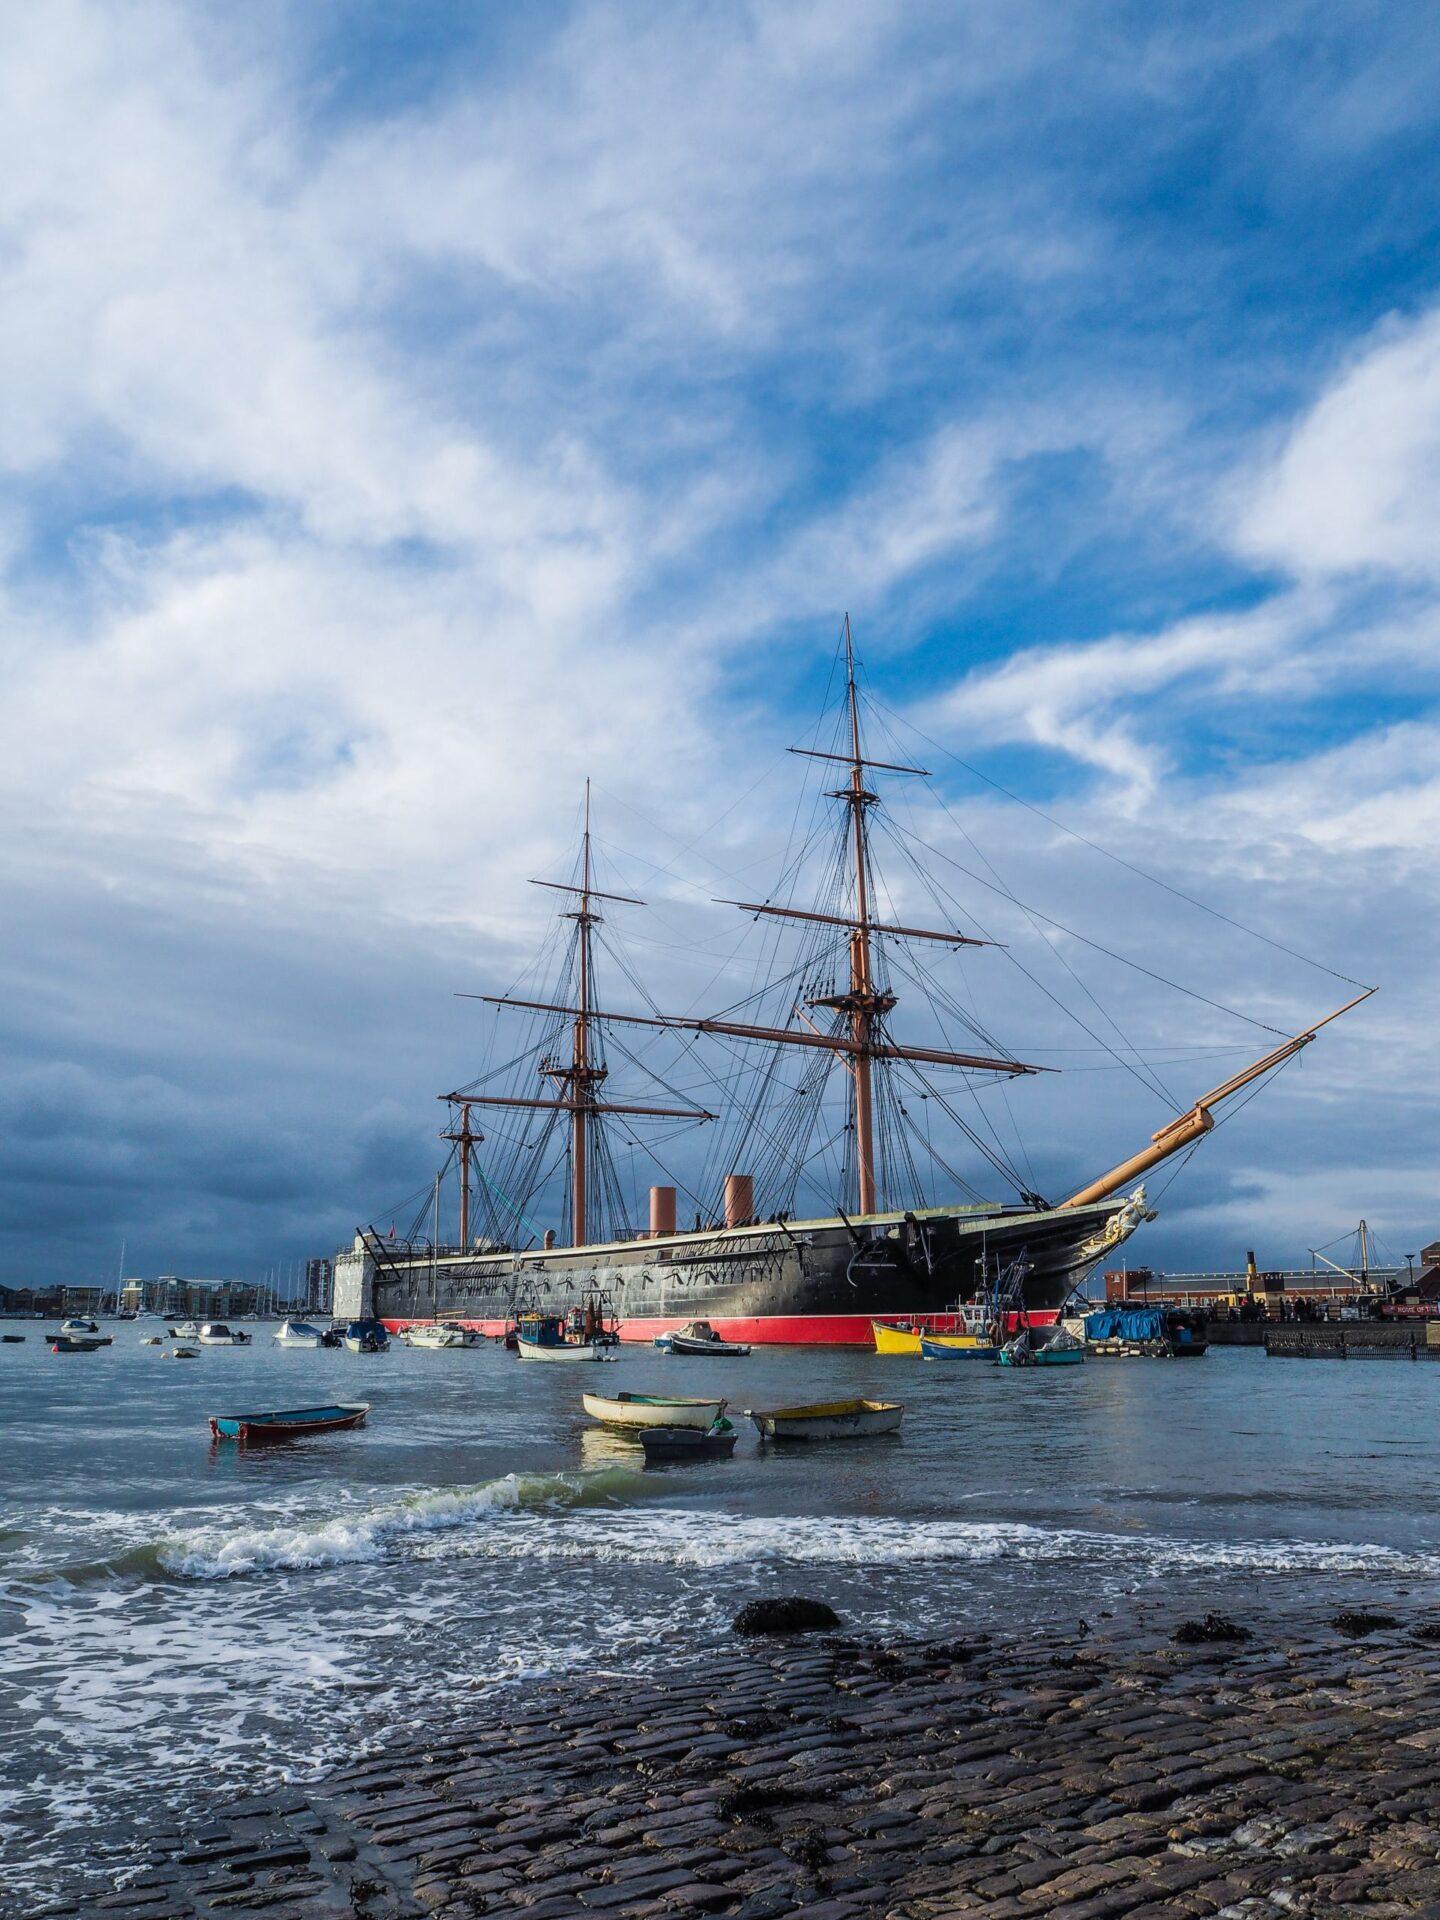 HMS Warrior - Victorian Festival of Christmas at Portsmouth Historic Dockyard